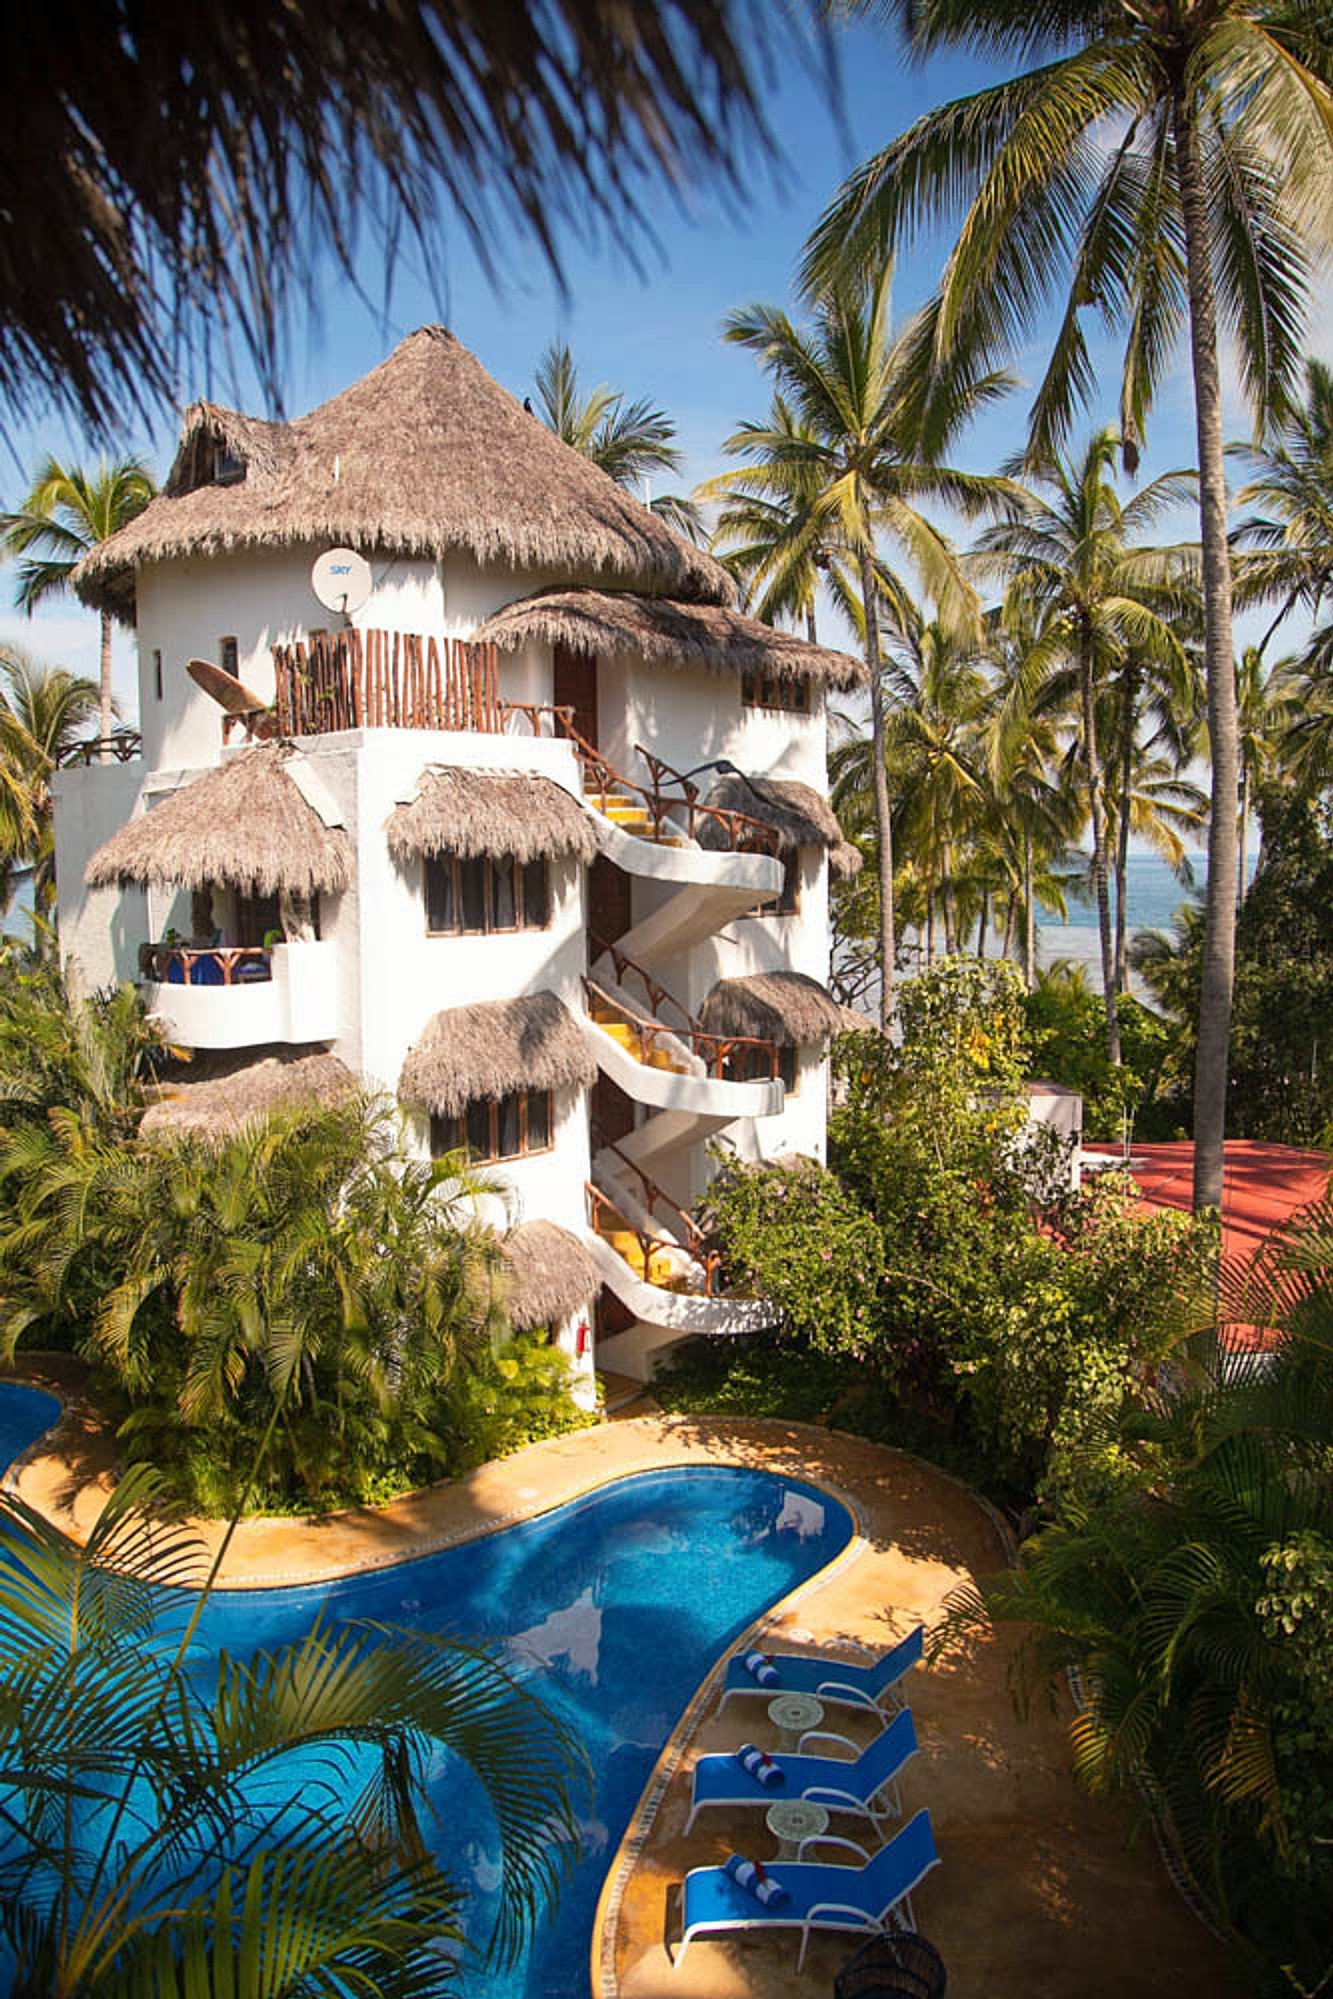 Hotel Sayulita Beach Front View